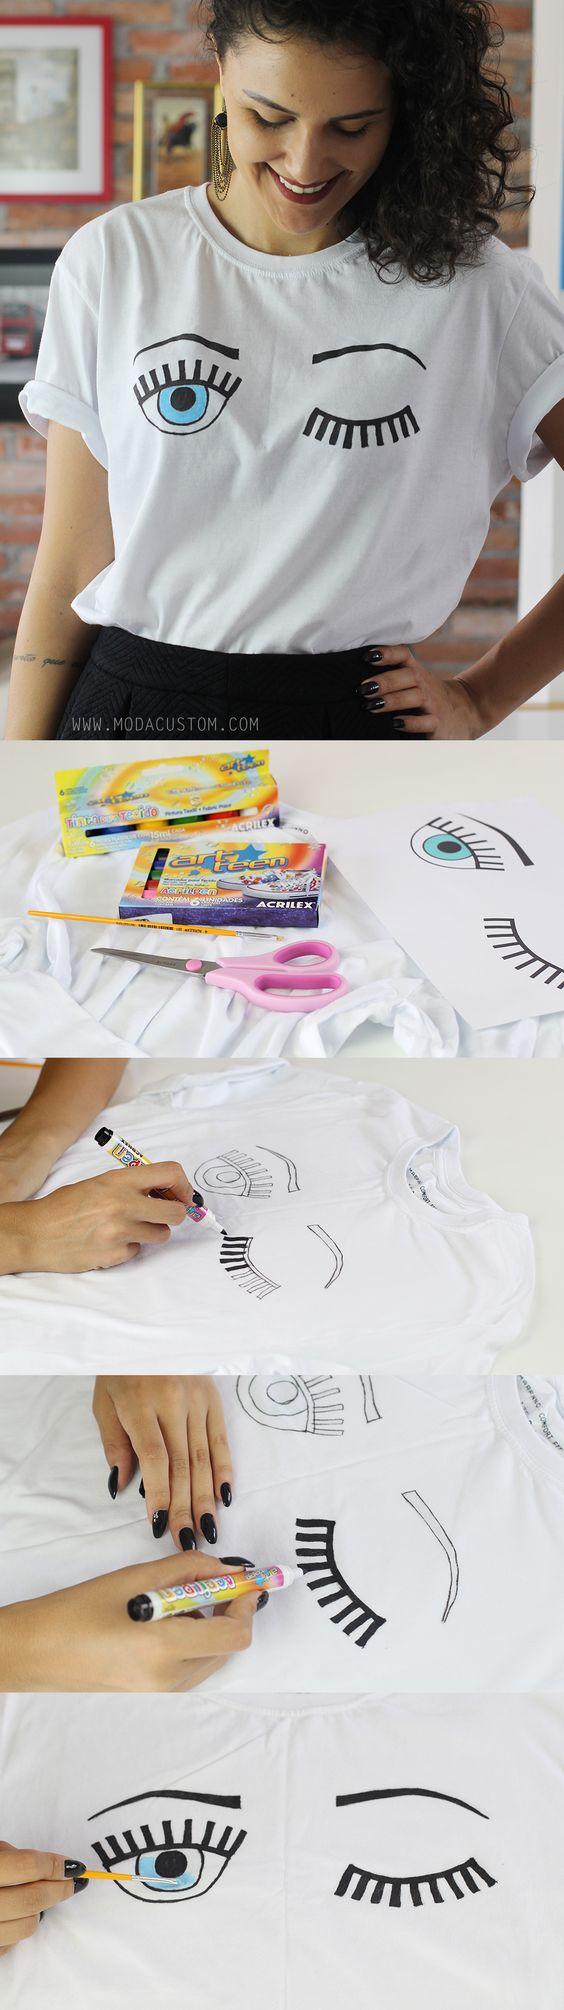 Tutorial camiseta cílios no blog: http://modacustom.com.br/2016/03/01/tutorial-camiseta-com-estampa-de-cilios/: